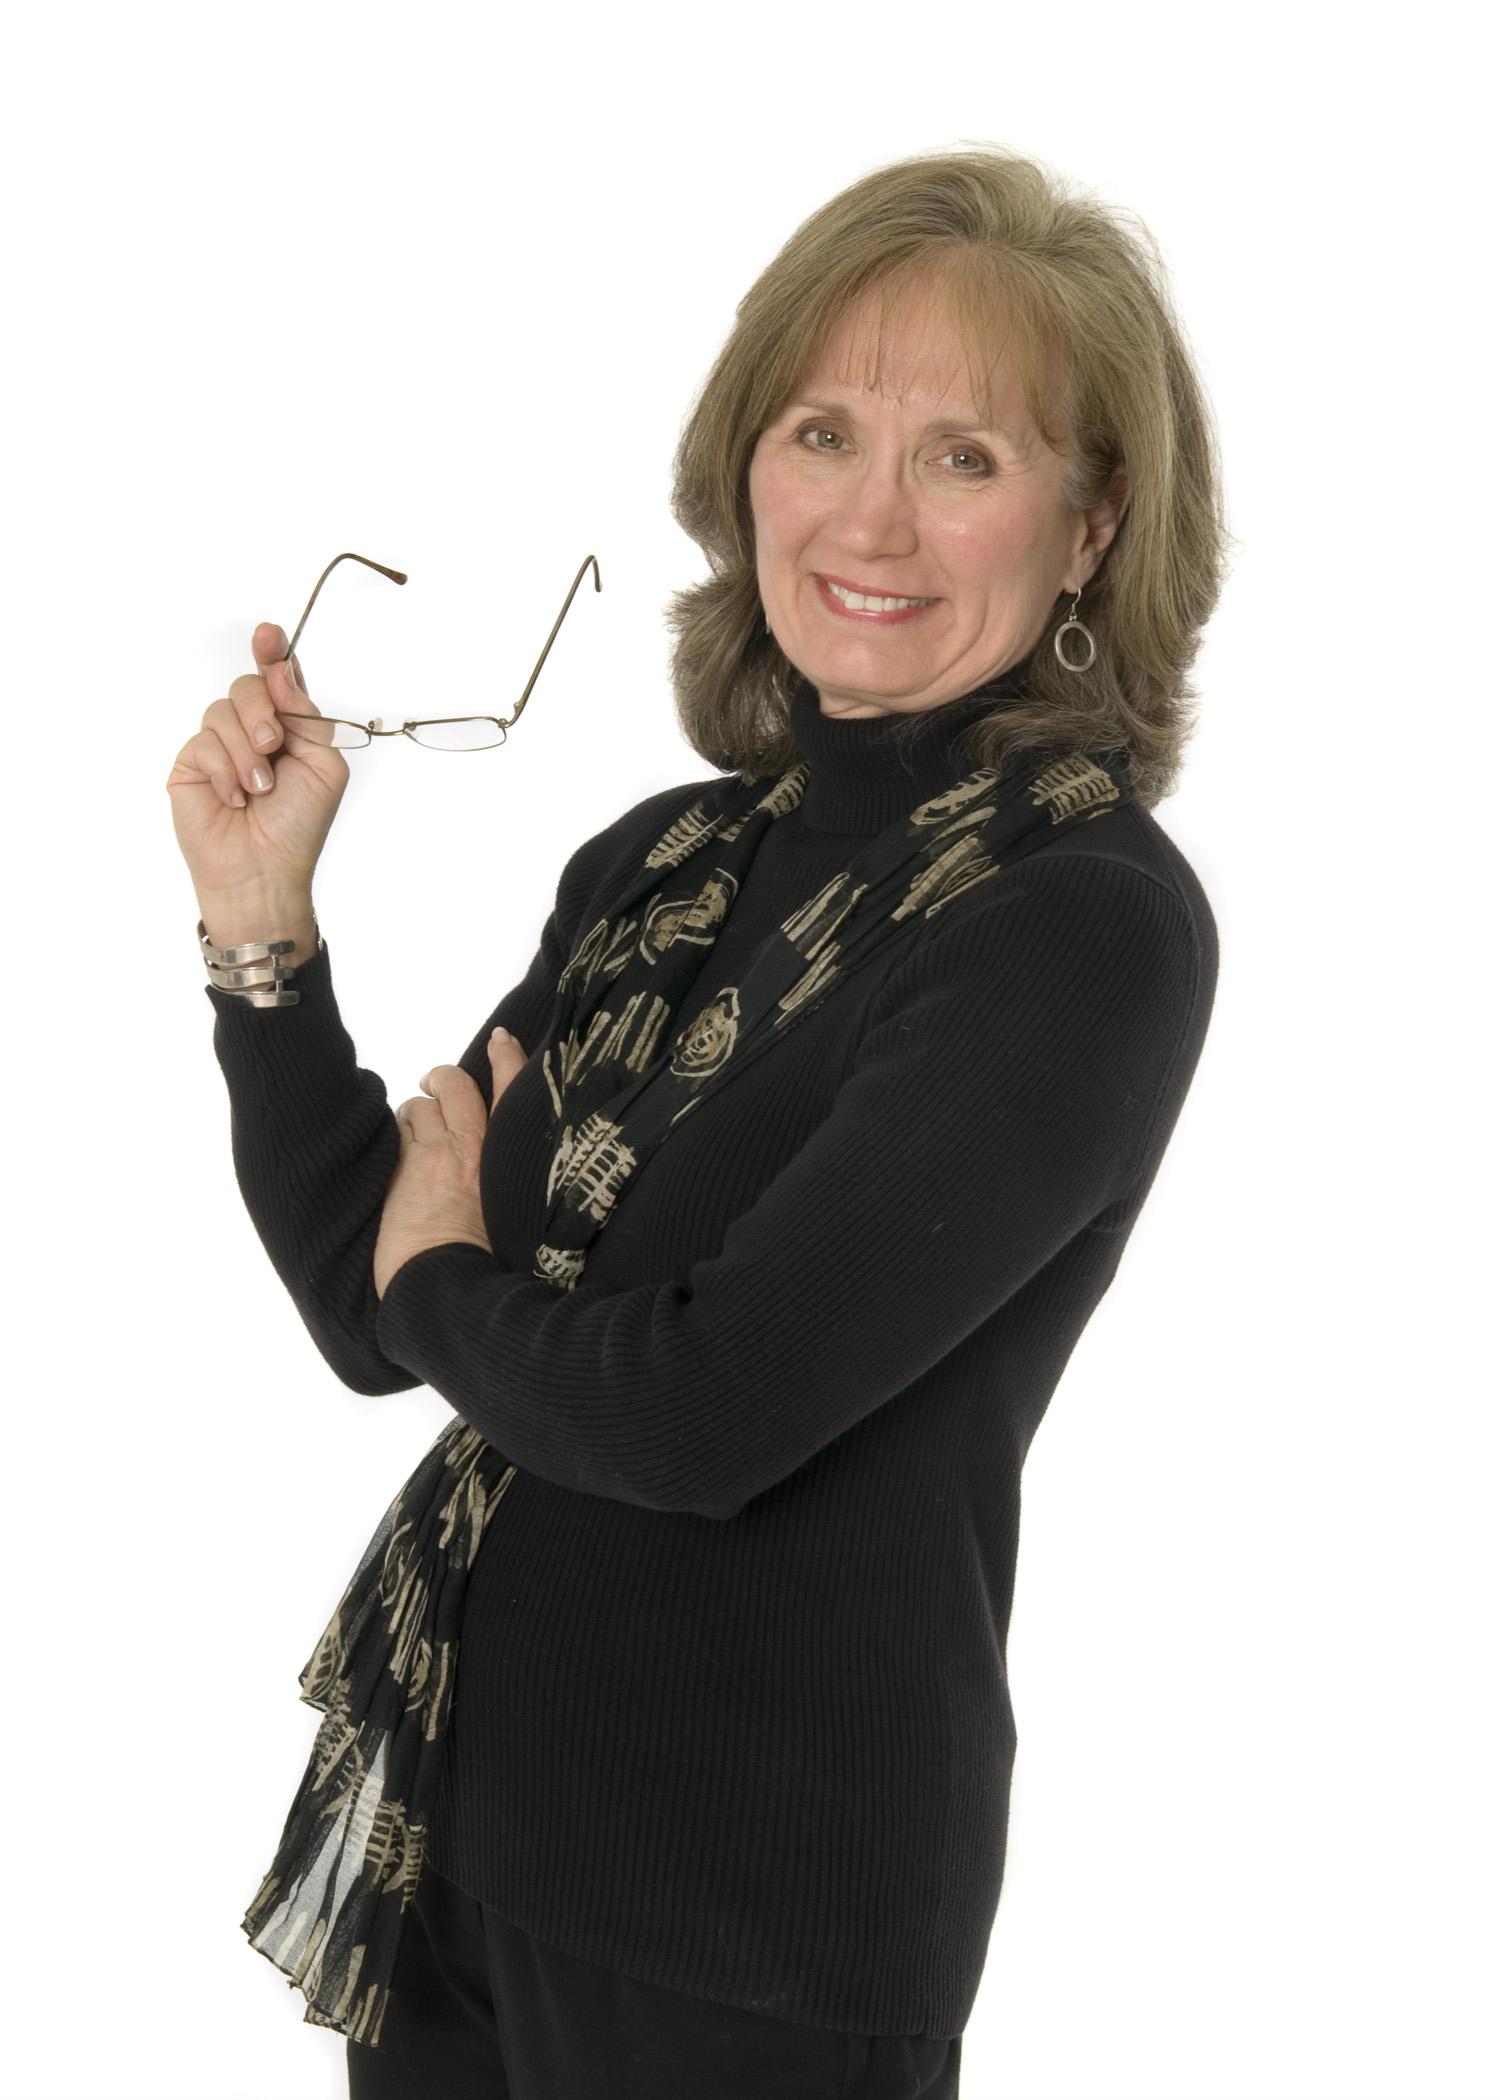 Denise Allen Zwicker, freelance writer